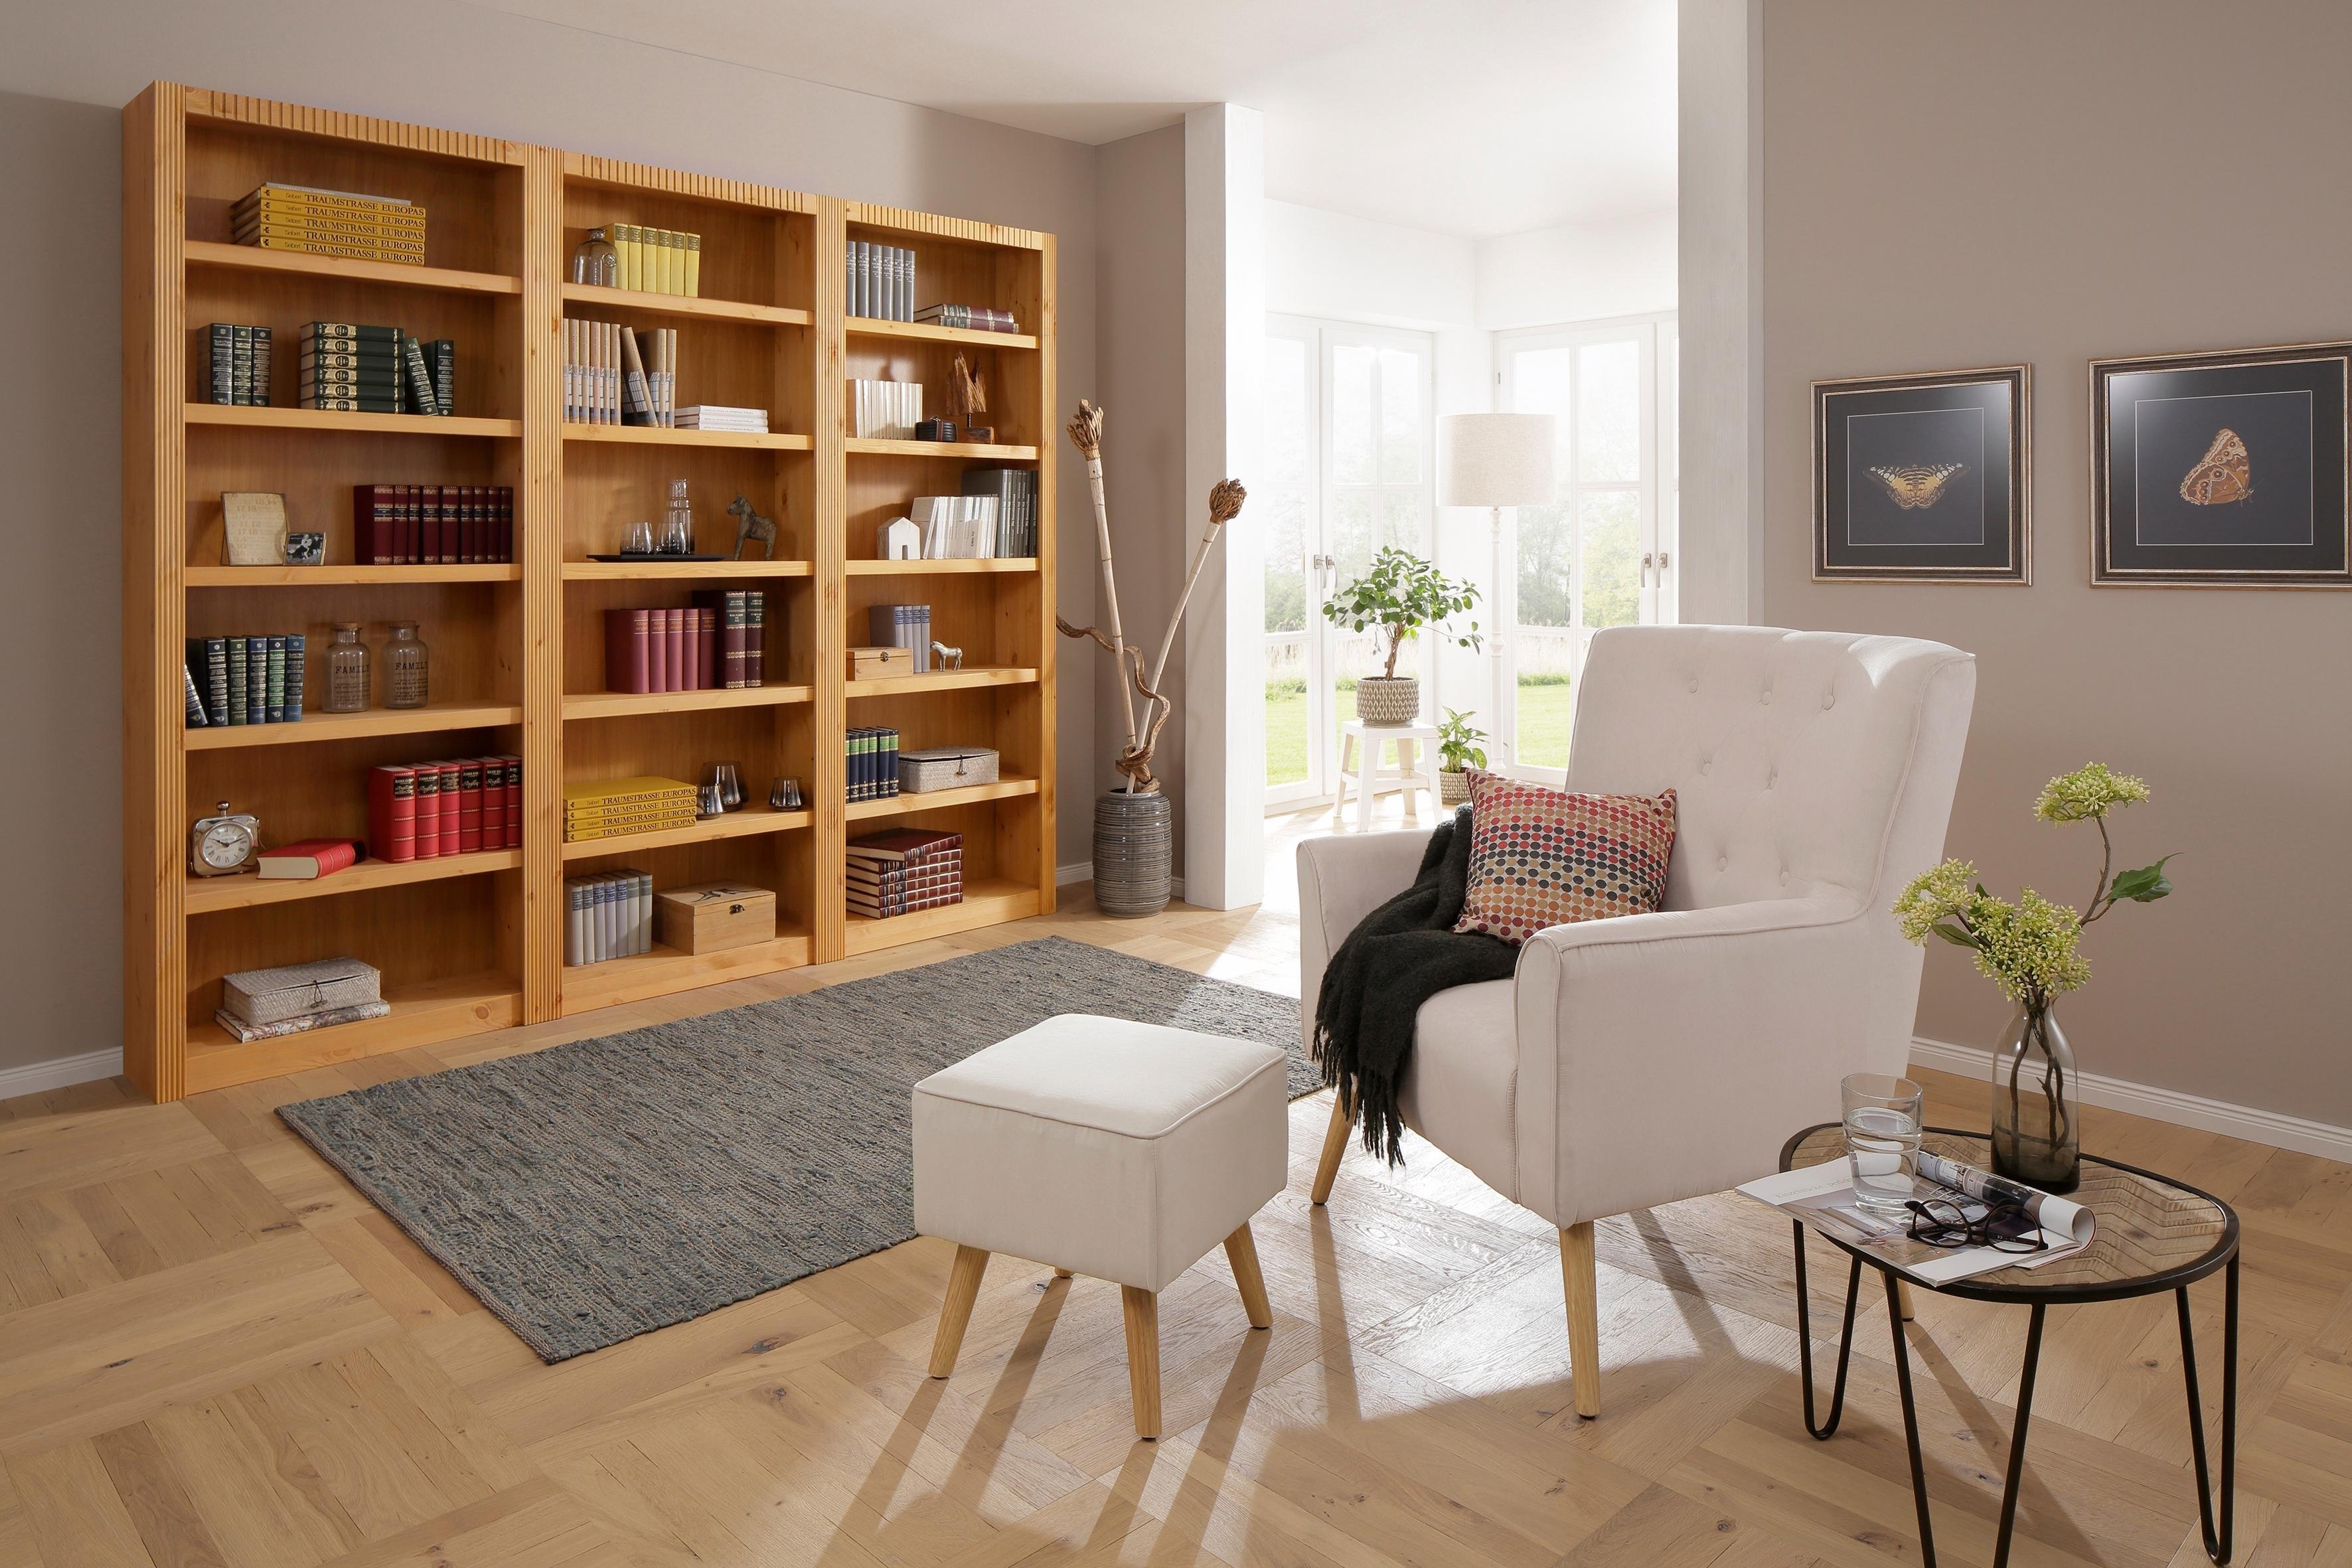 boekenwand met ladeset 3 delig home affaire open kast billie breedte 1735 cm home affaire boekenkast konrad